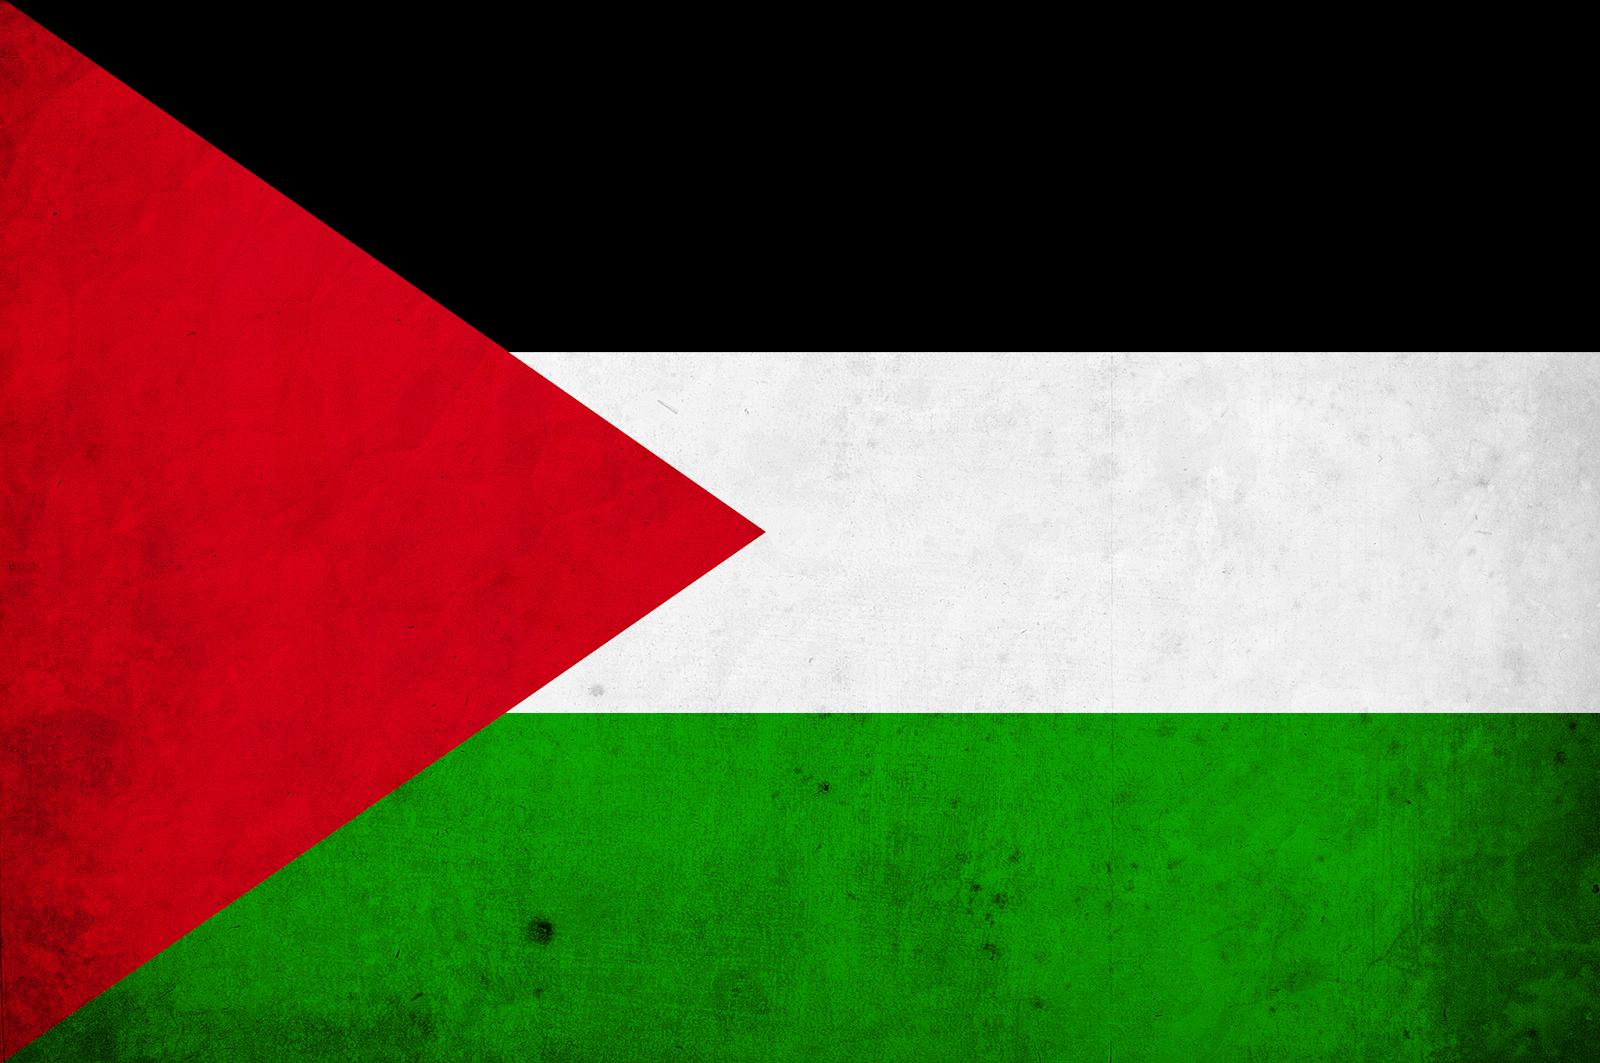 Palestine Flag Png image #38255